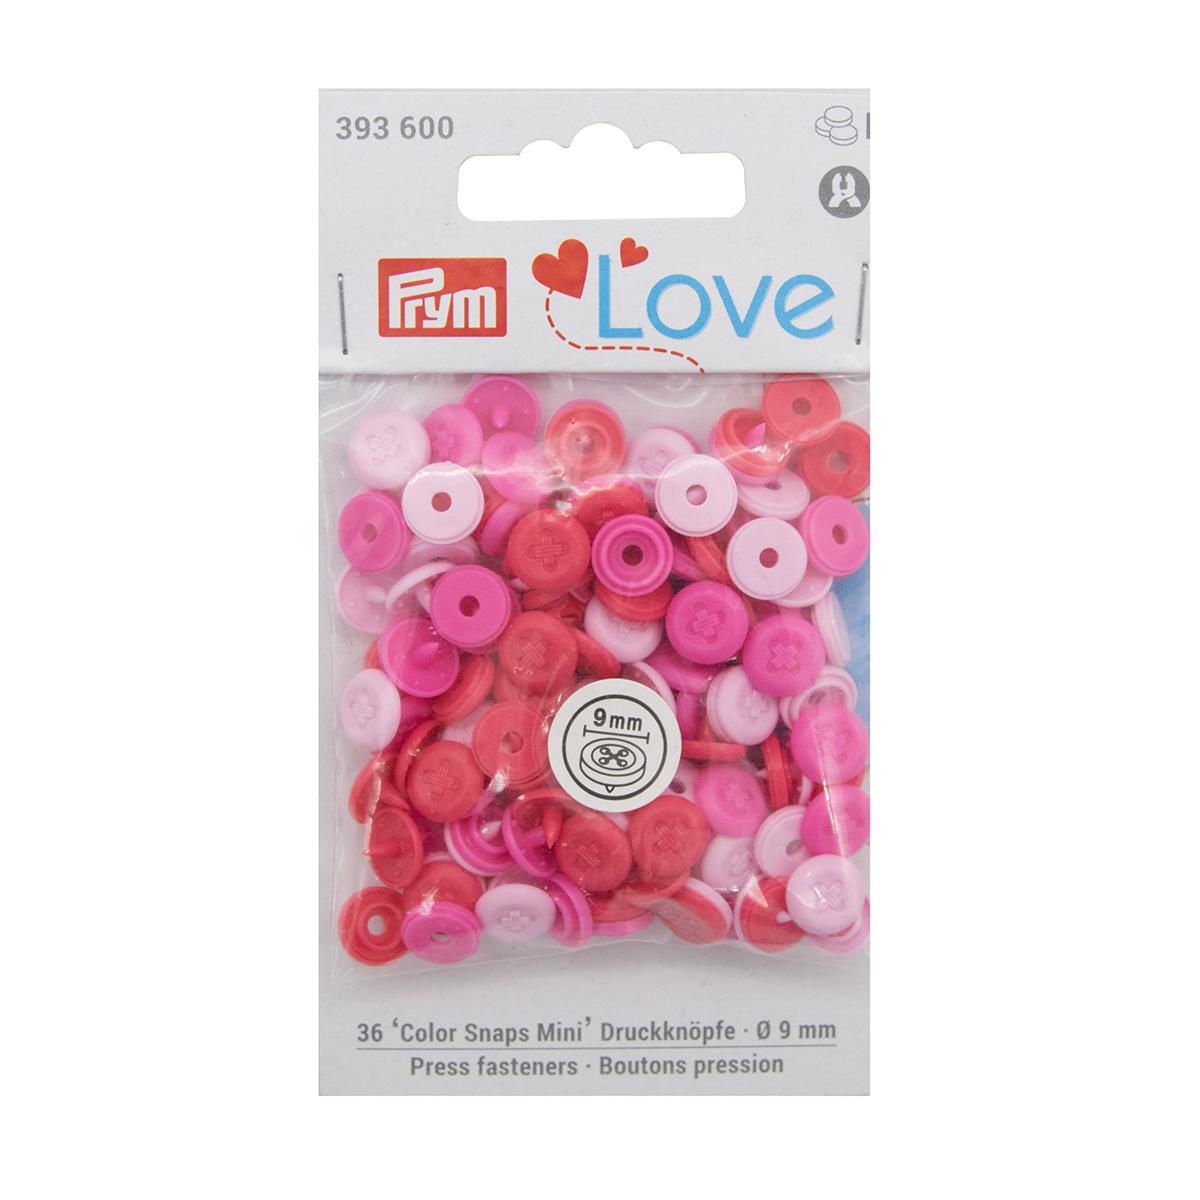 393600 Кнопки ColorSnapsMini имитация стежка Prym Love, розовый 36шт Prym